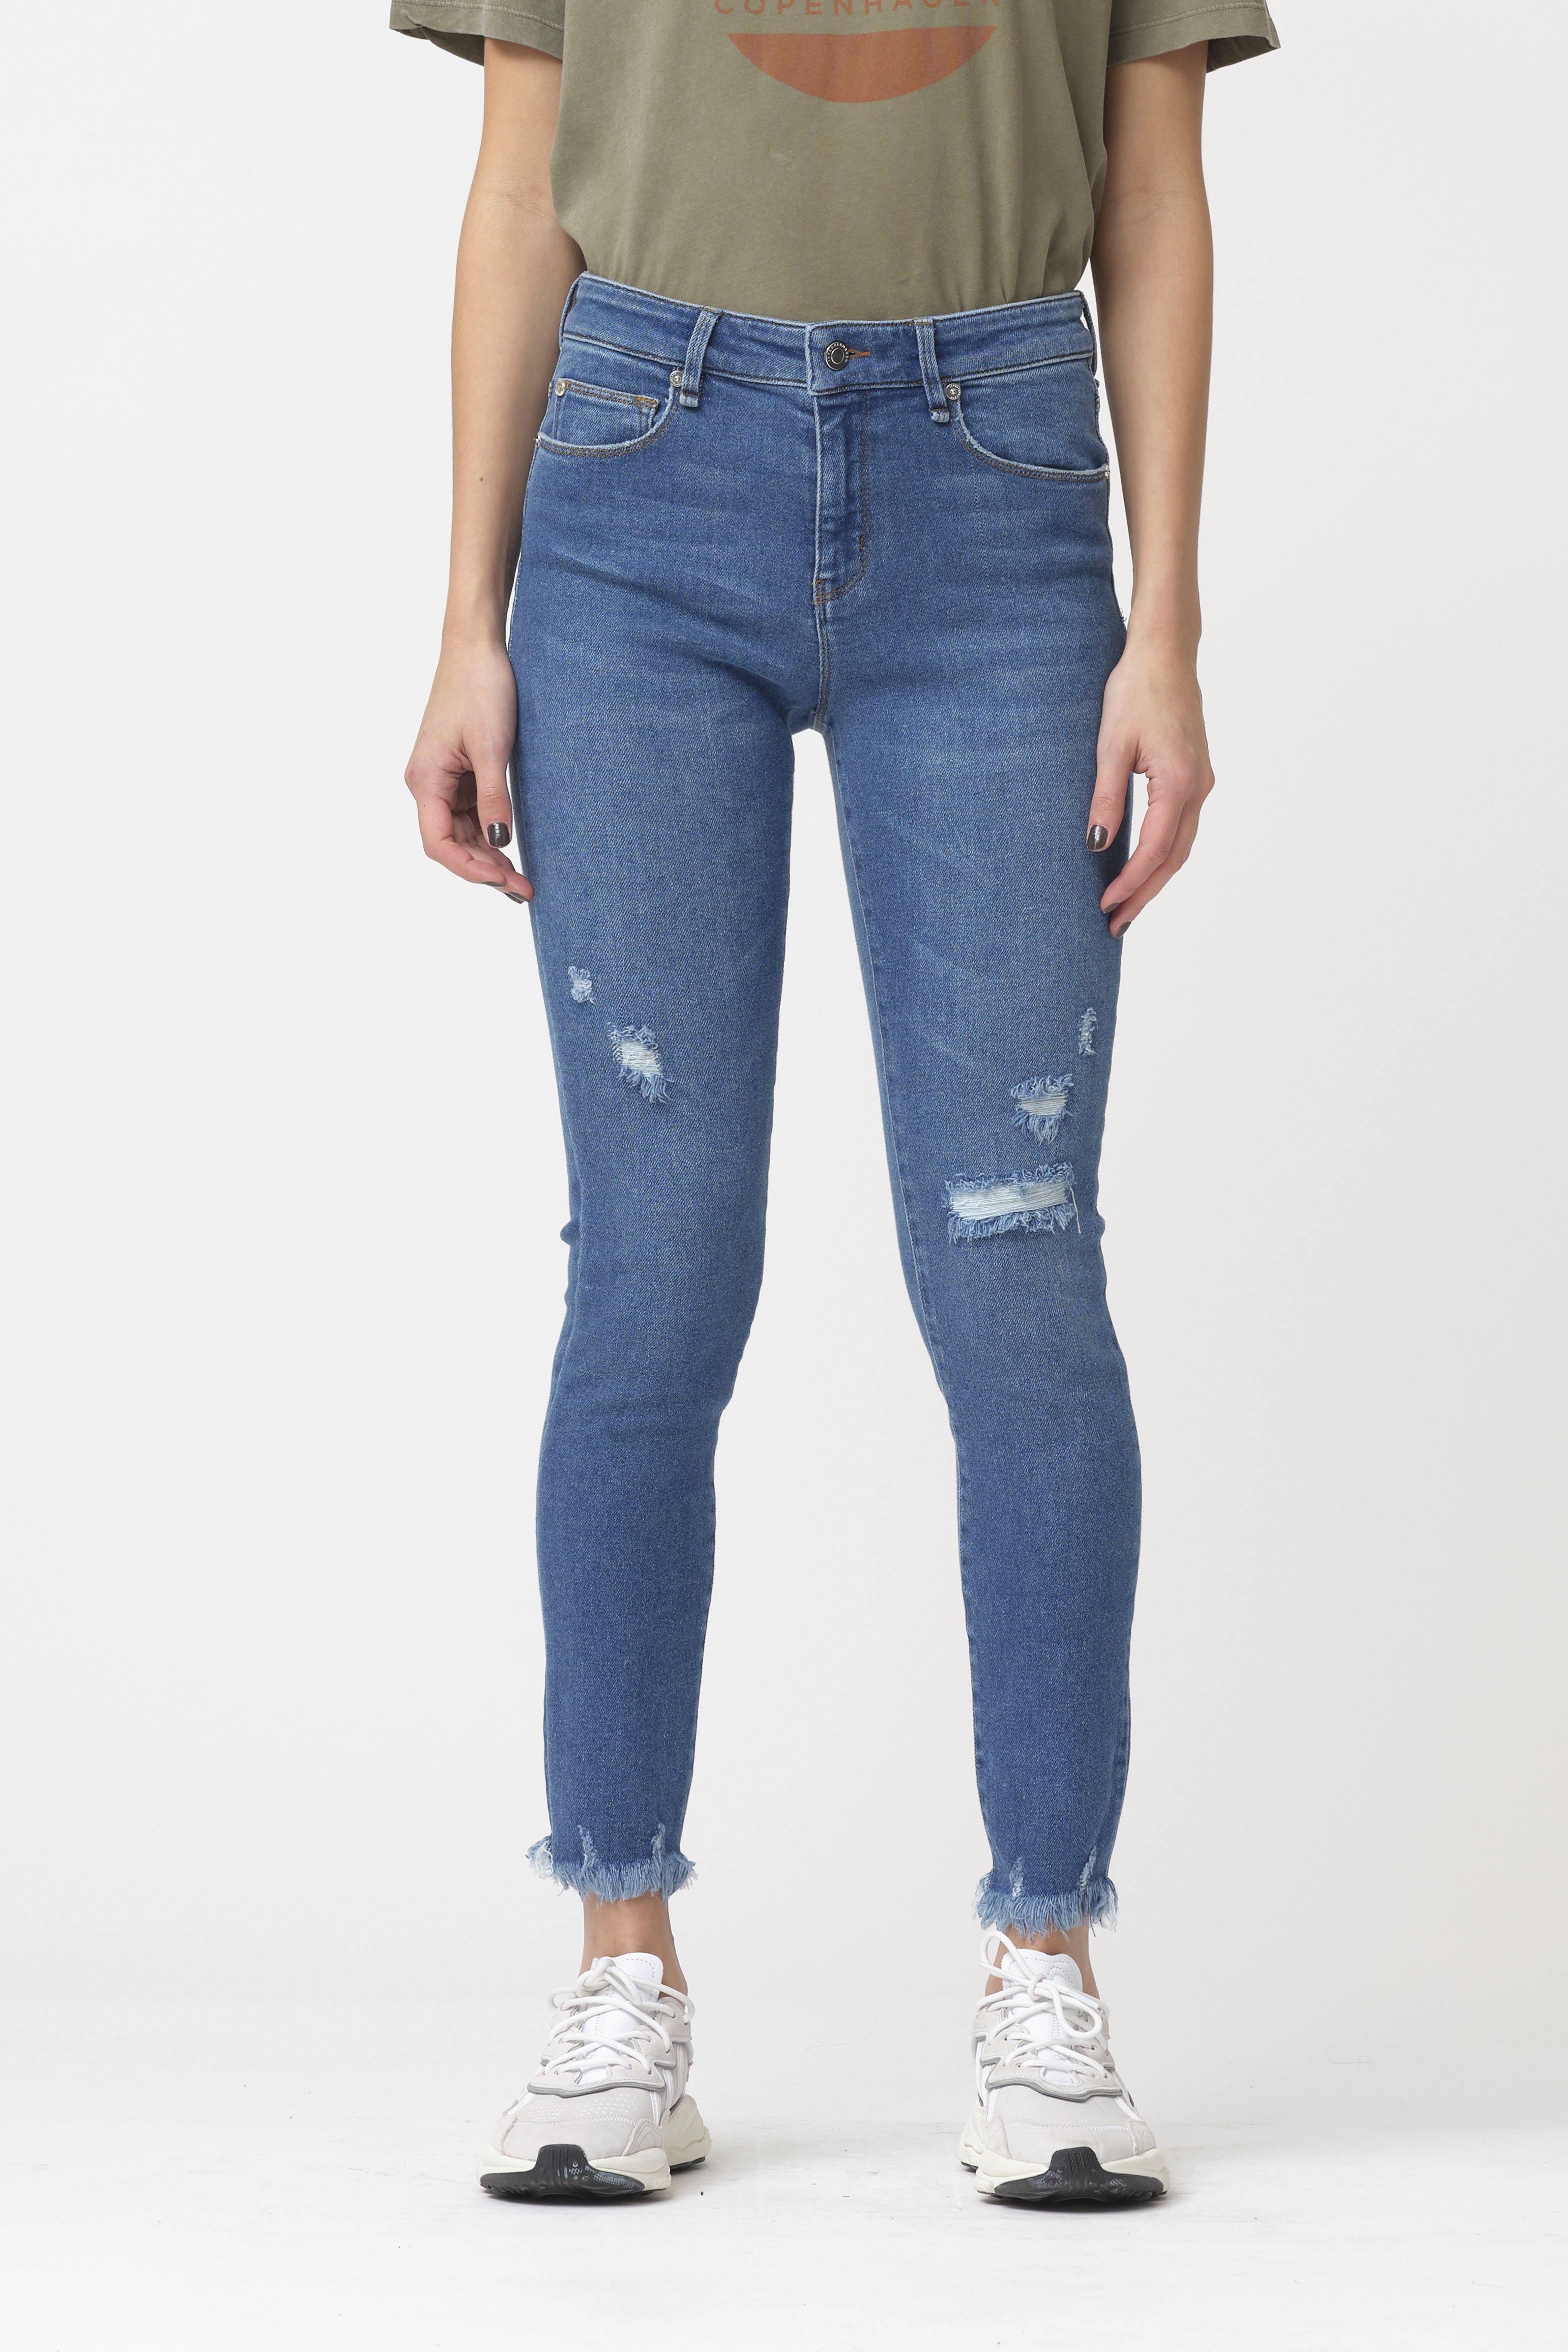 Ivy Copenhagen Alexa Ankle jeans, denim blue, 27/30